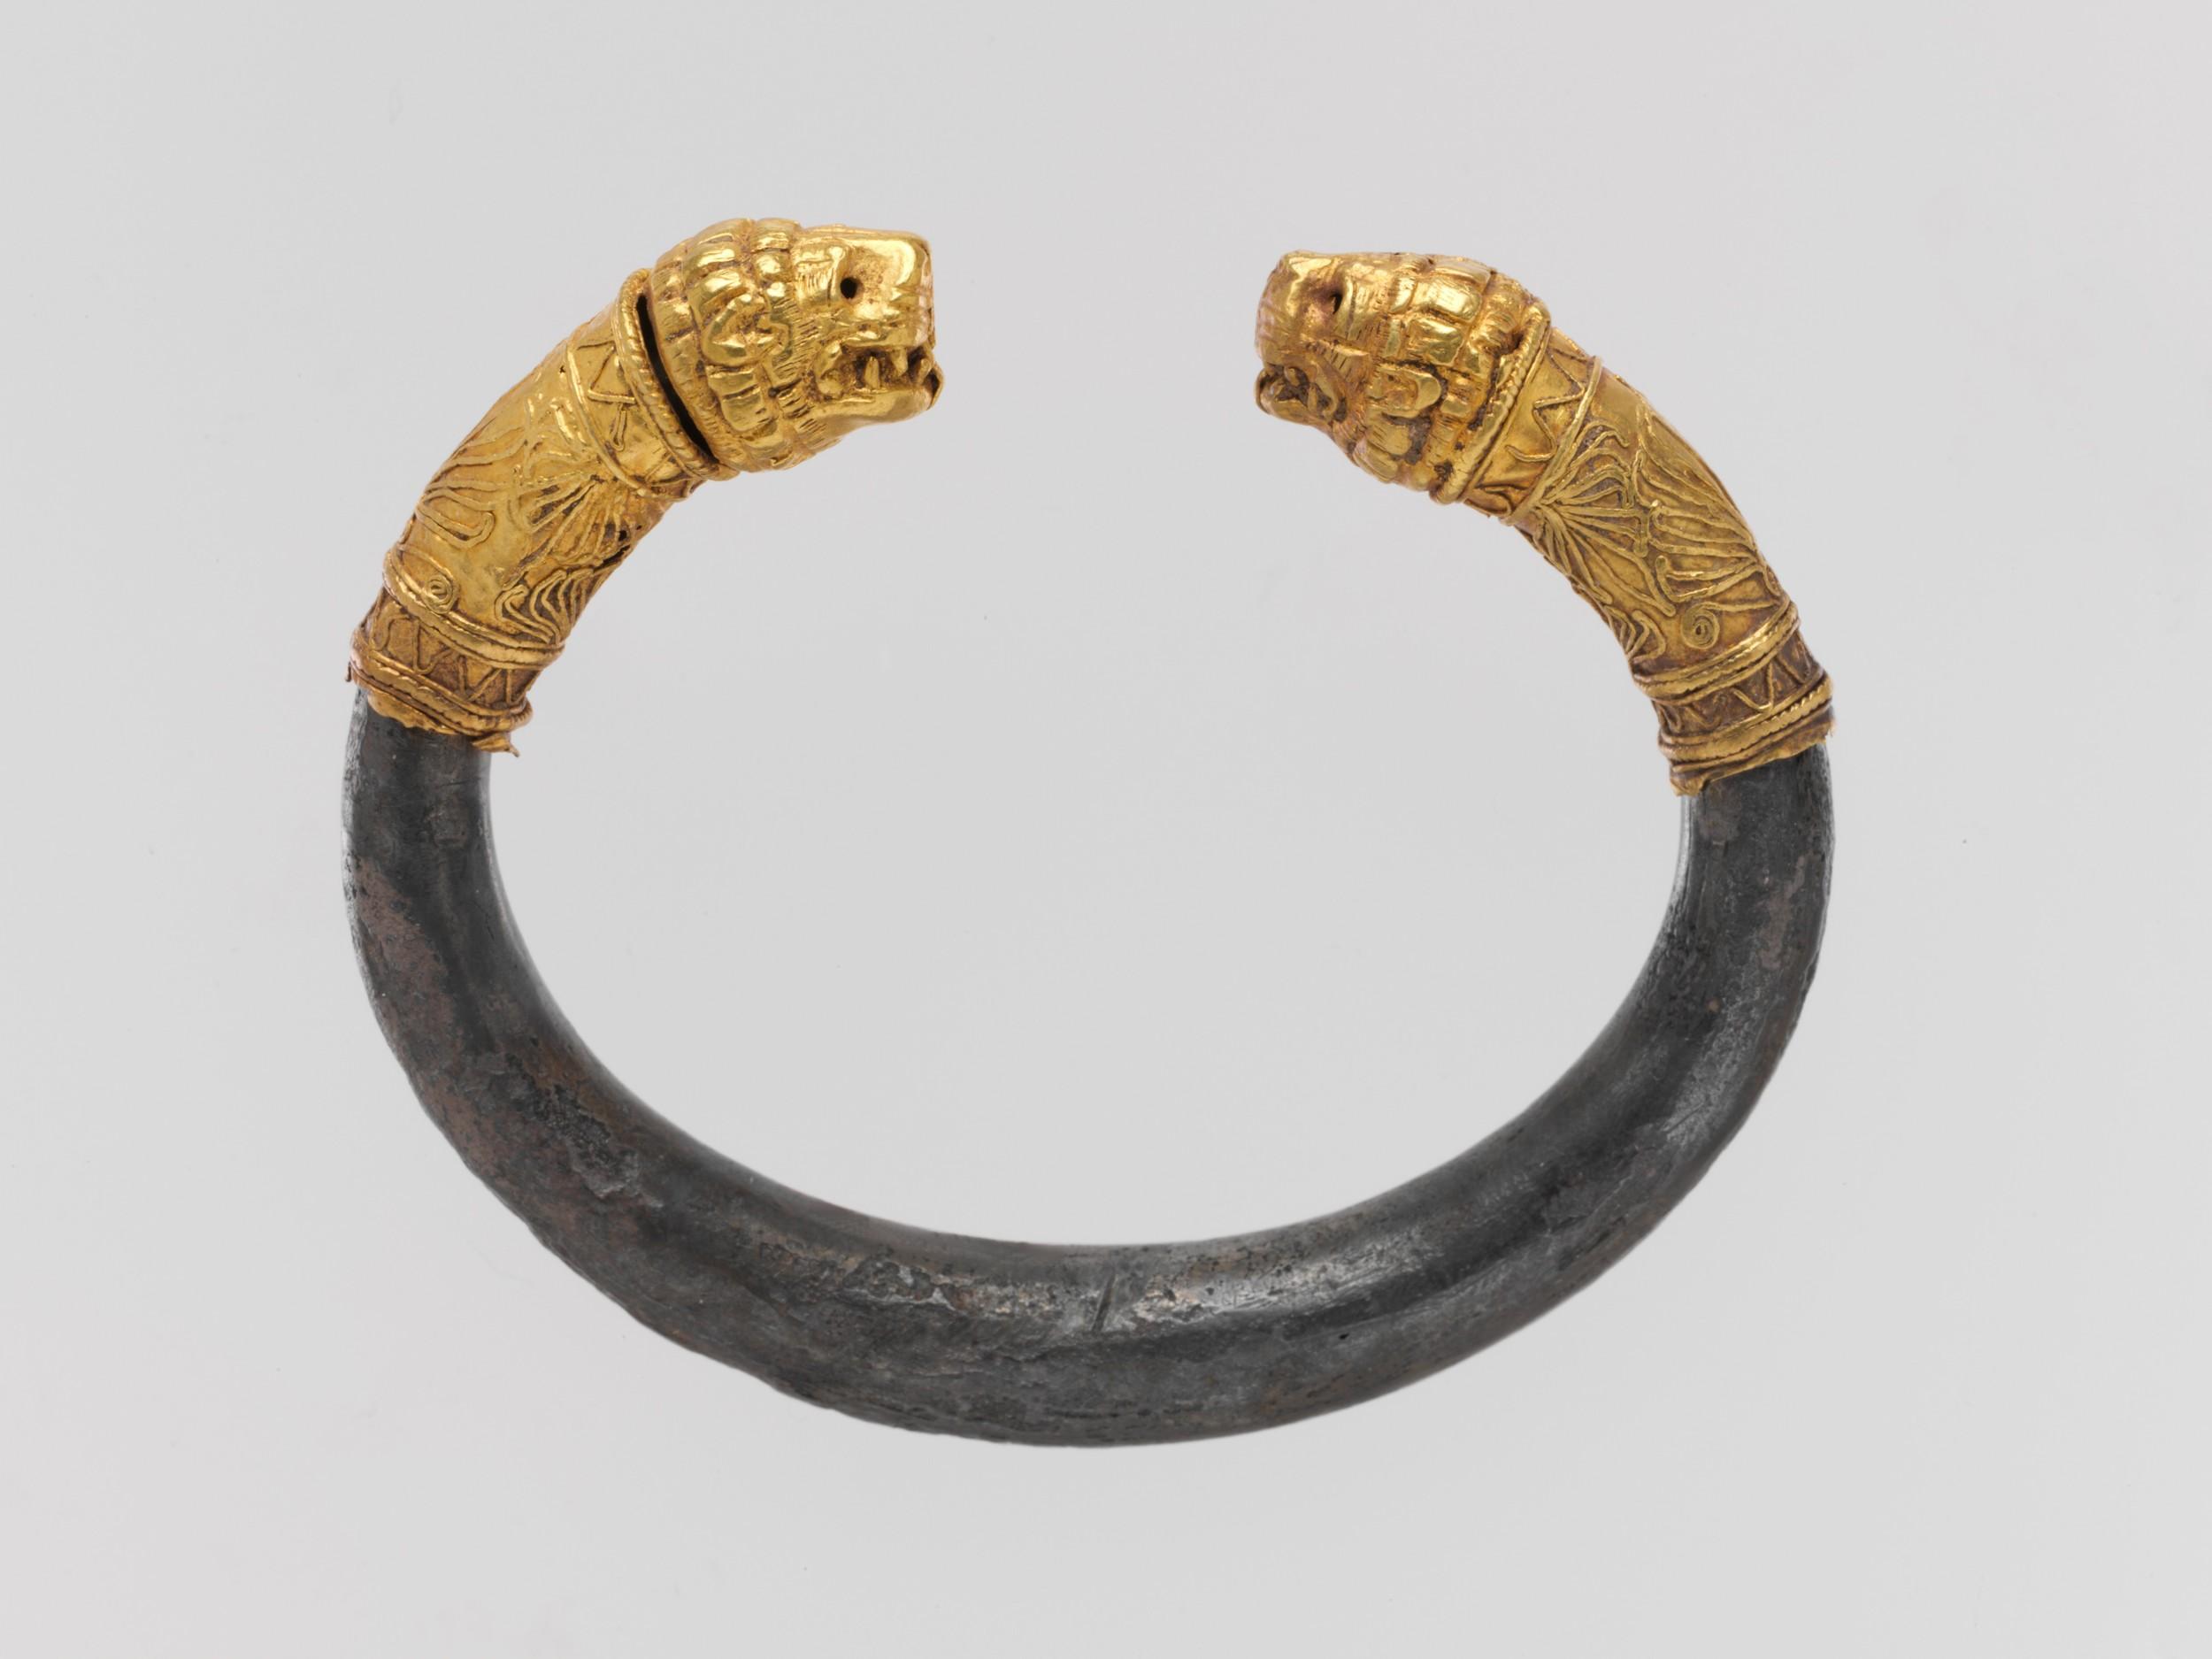 Silver Bracelet with Gold Lion Head Finials. Greek, 5th - 4th Century BCE. Metropolitan Museum of Art, 30.115.86.